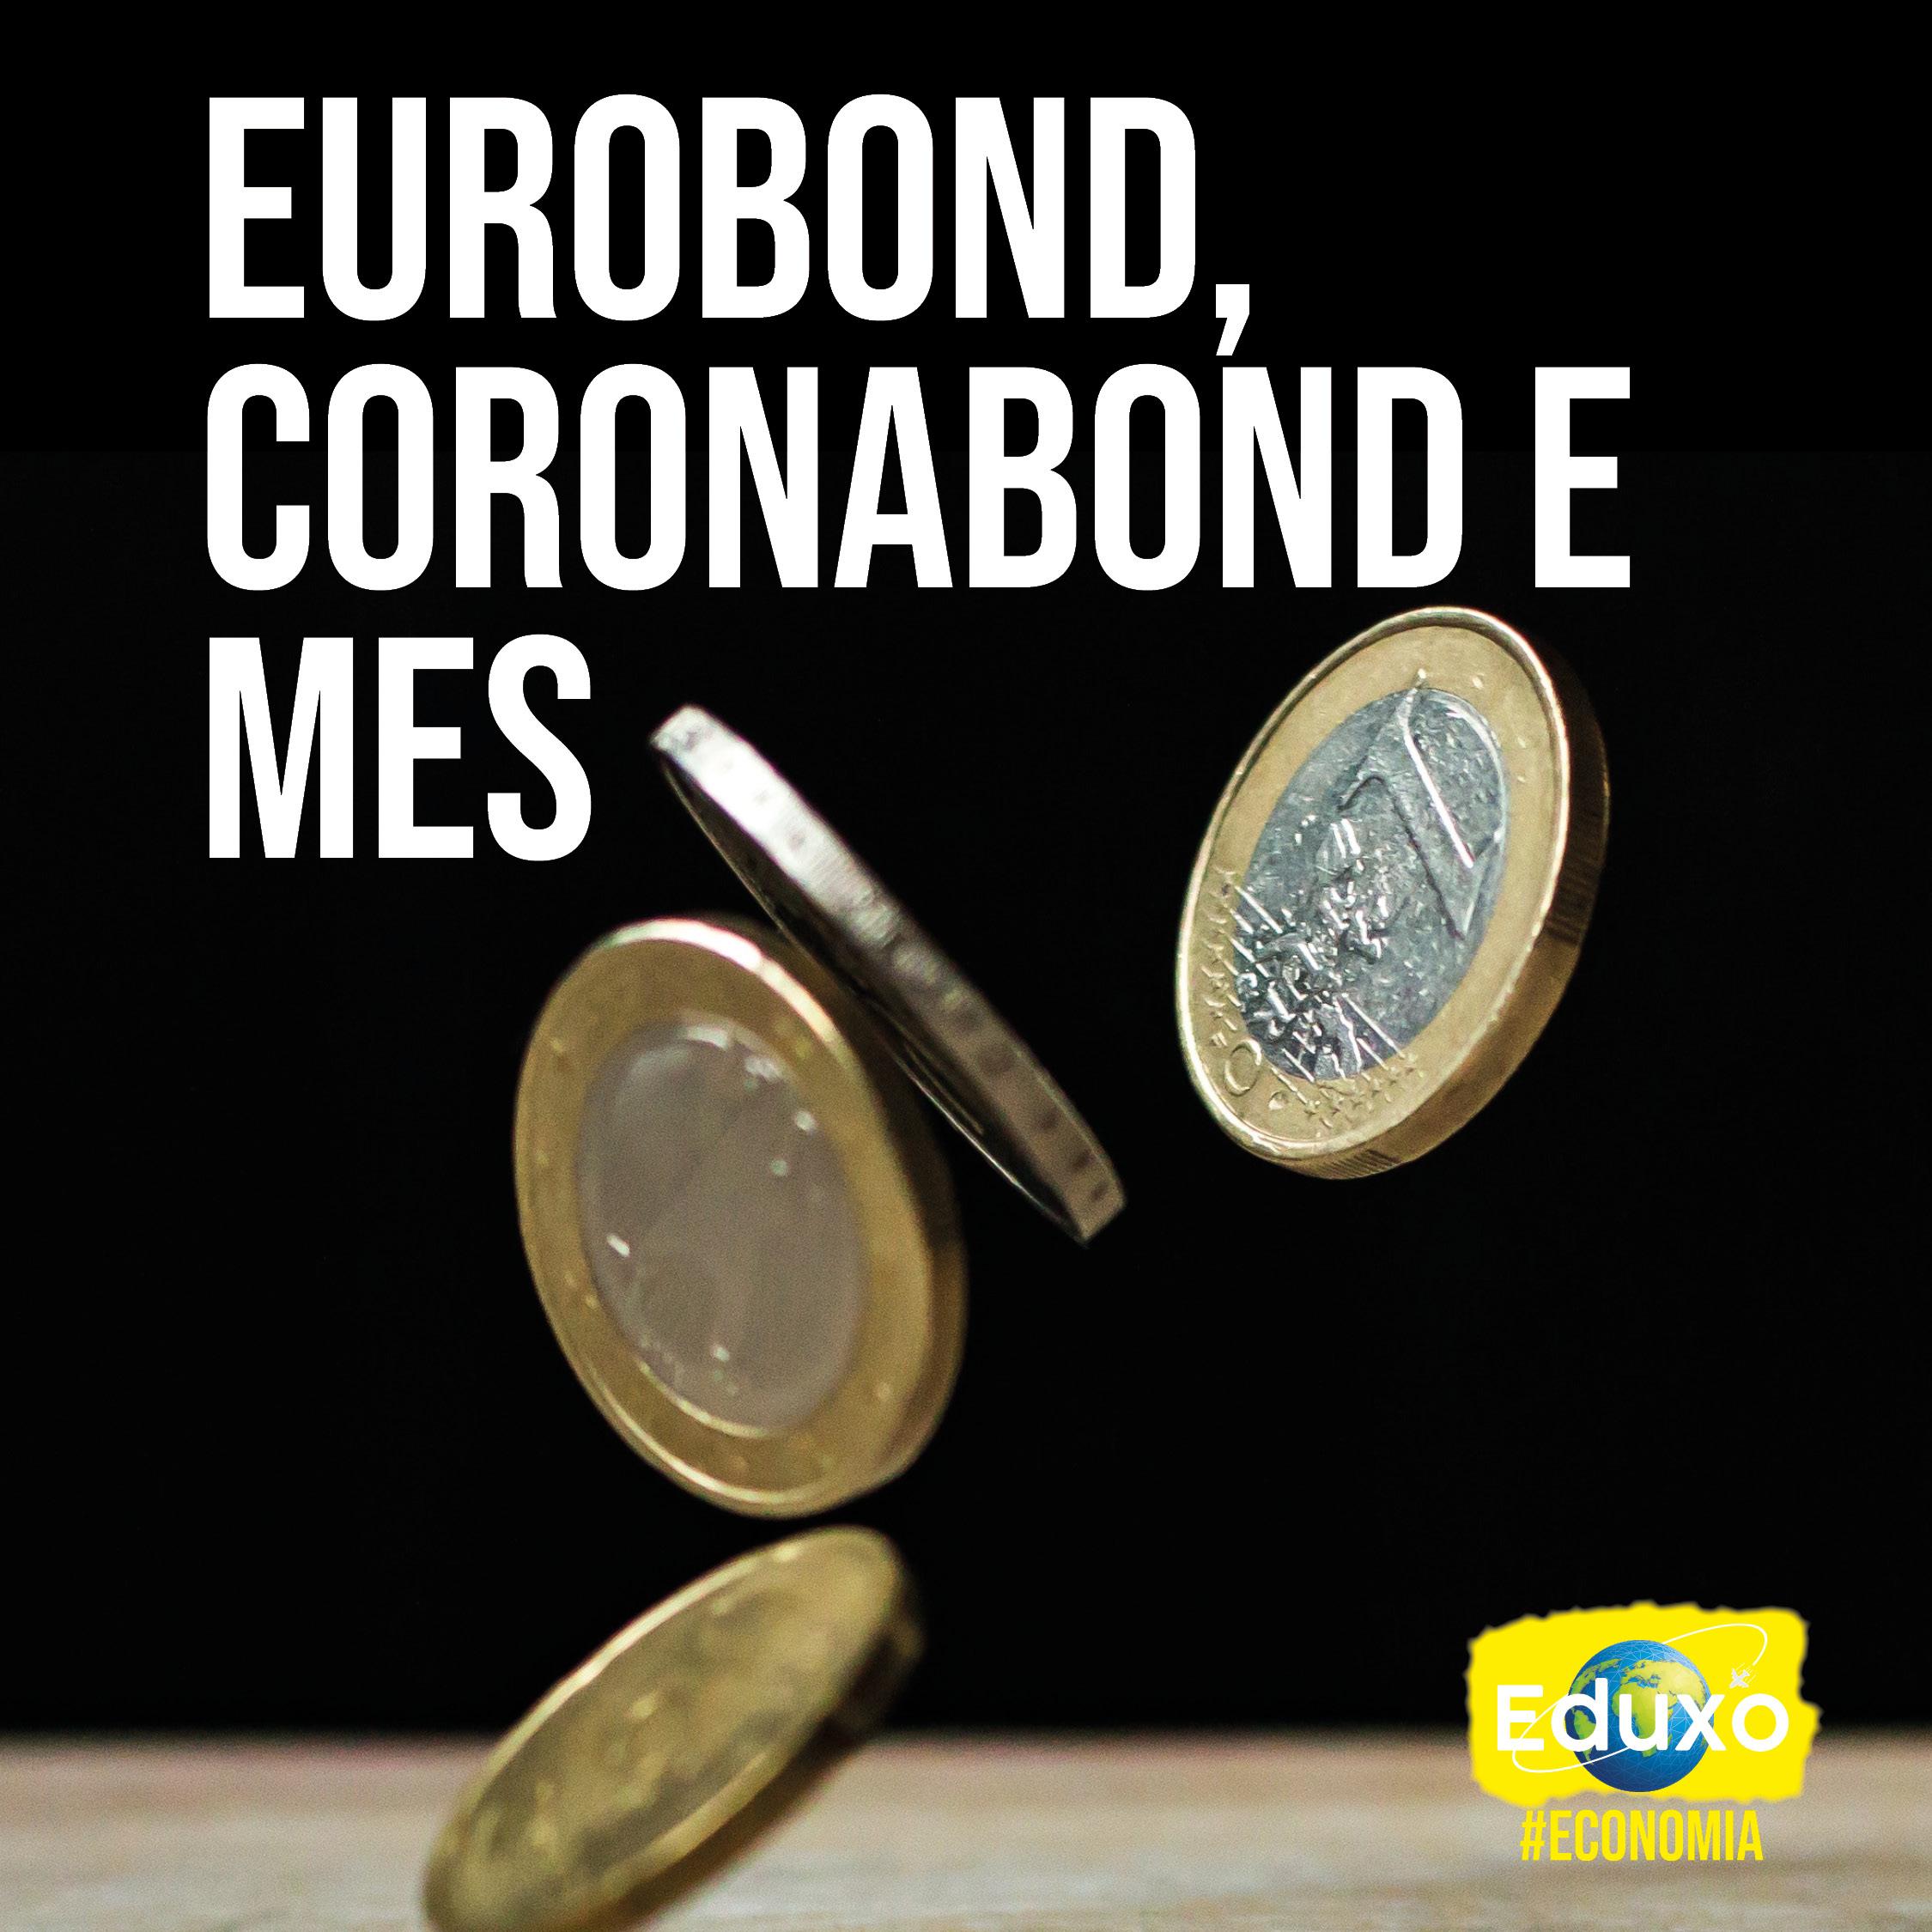 You are currently viewing Eurobond, Coronabond e MES